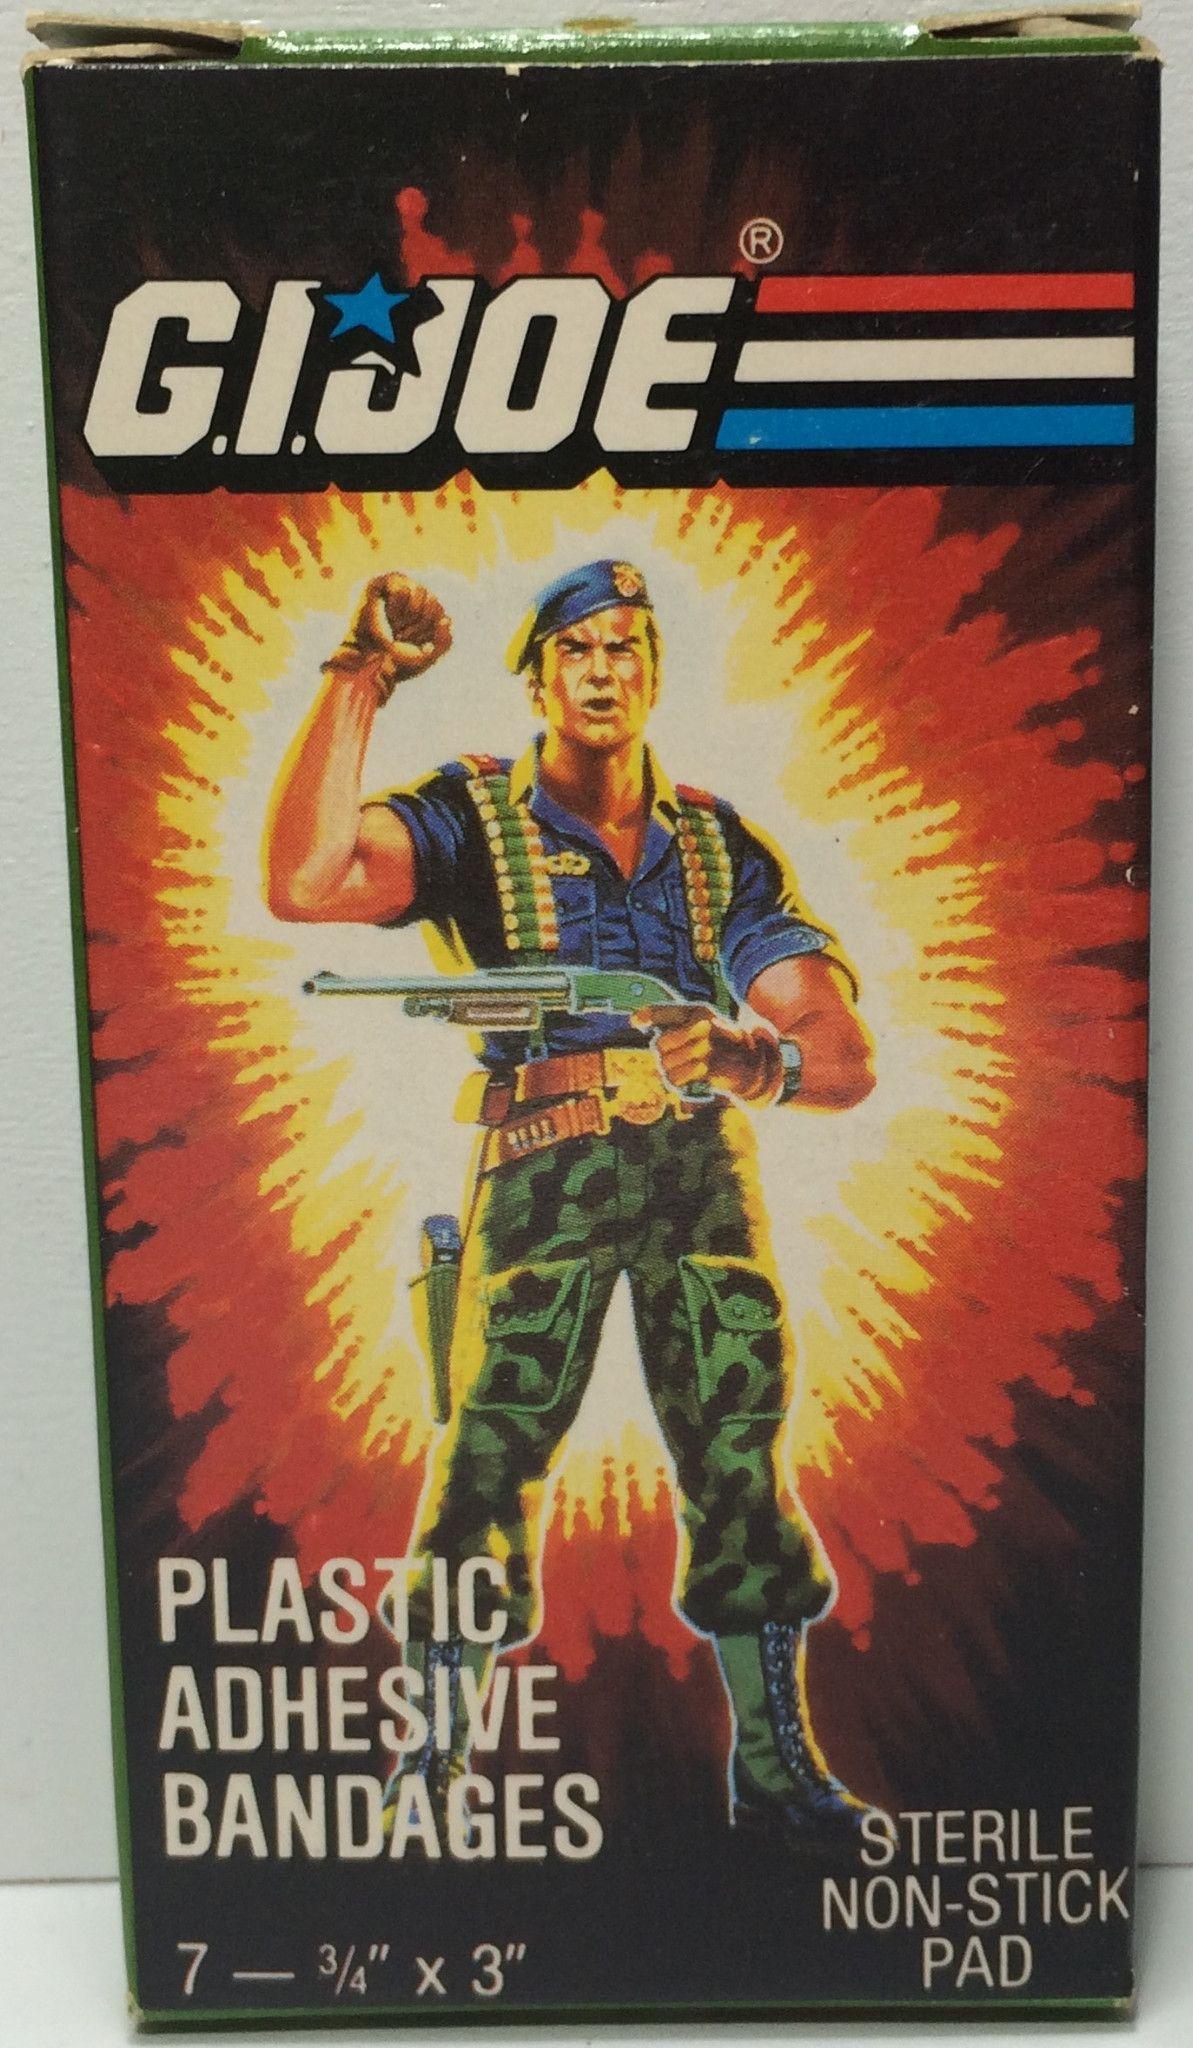 (TAS031835) - 1986 Hasbro G.I. Joe Plastic Adhesive Bandages